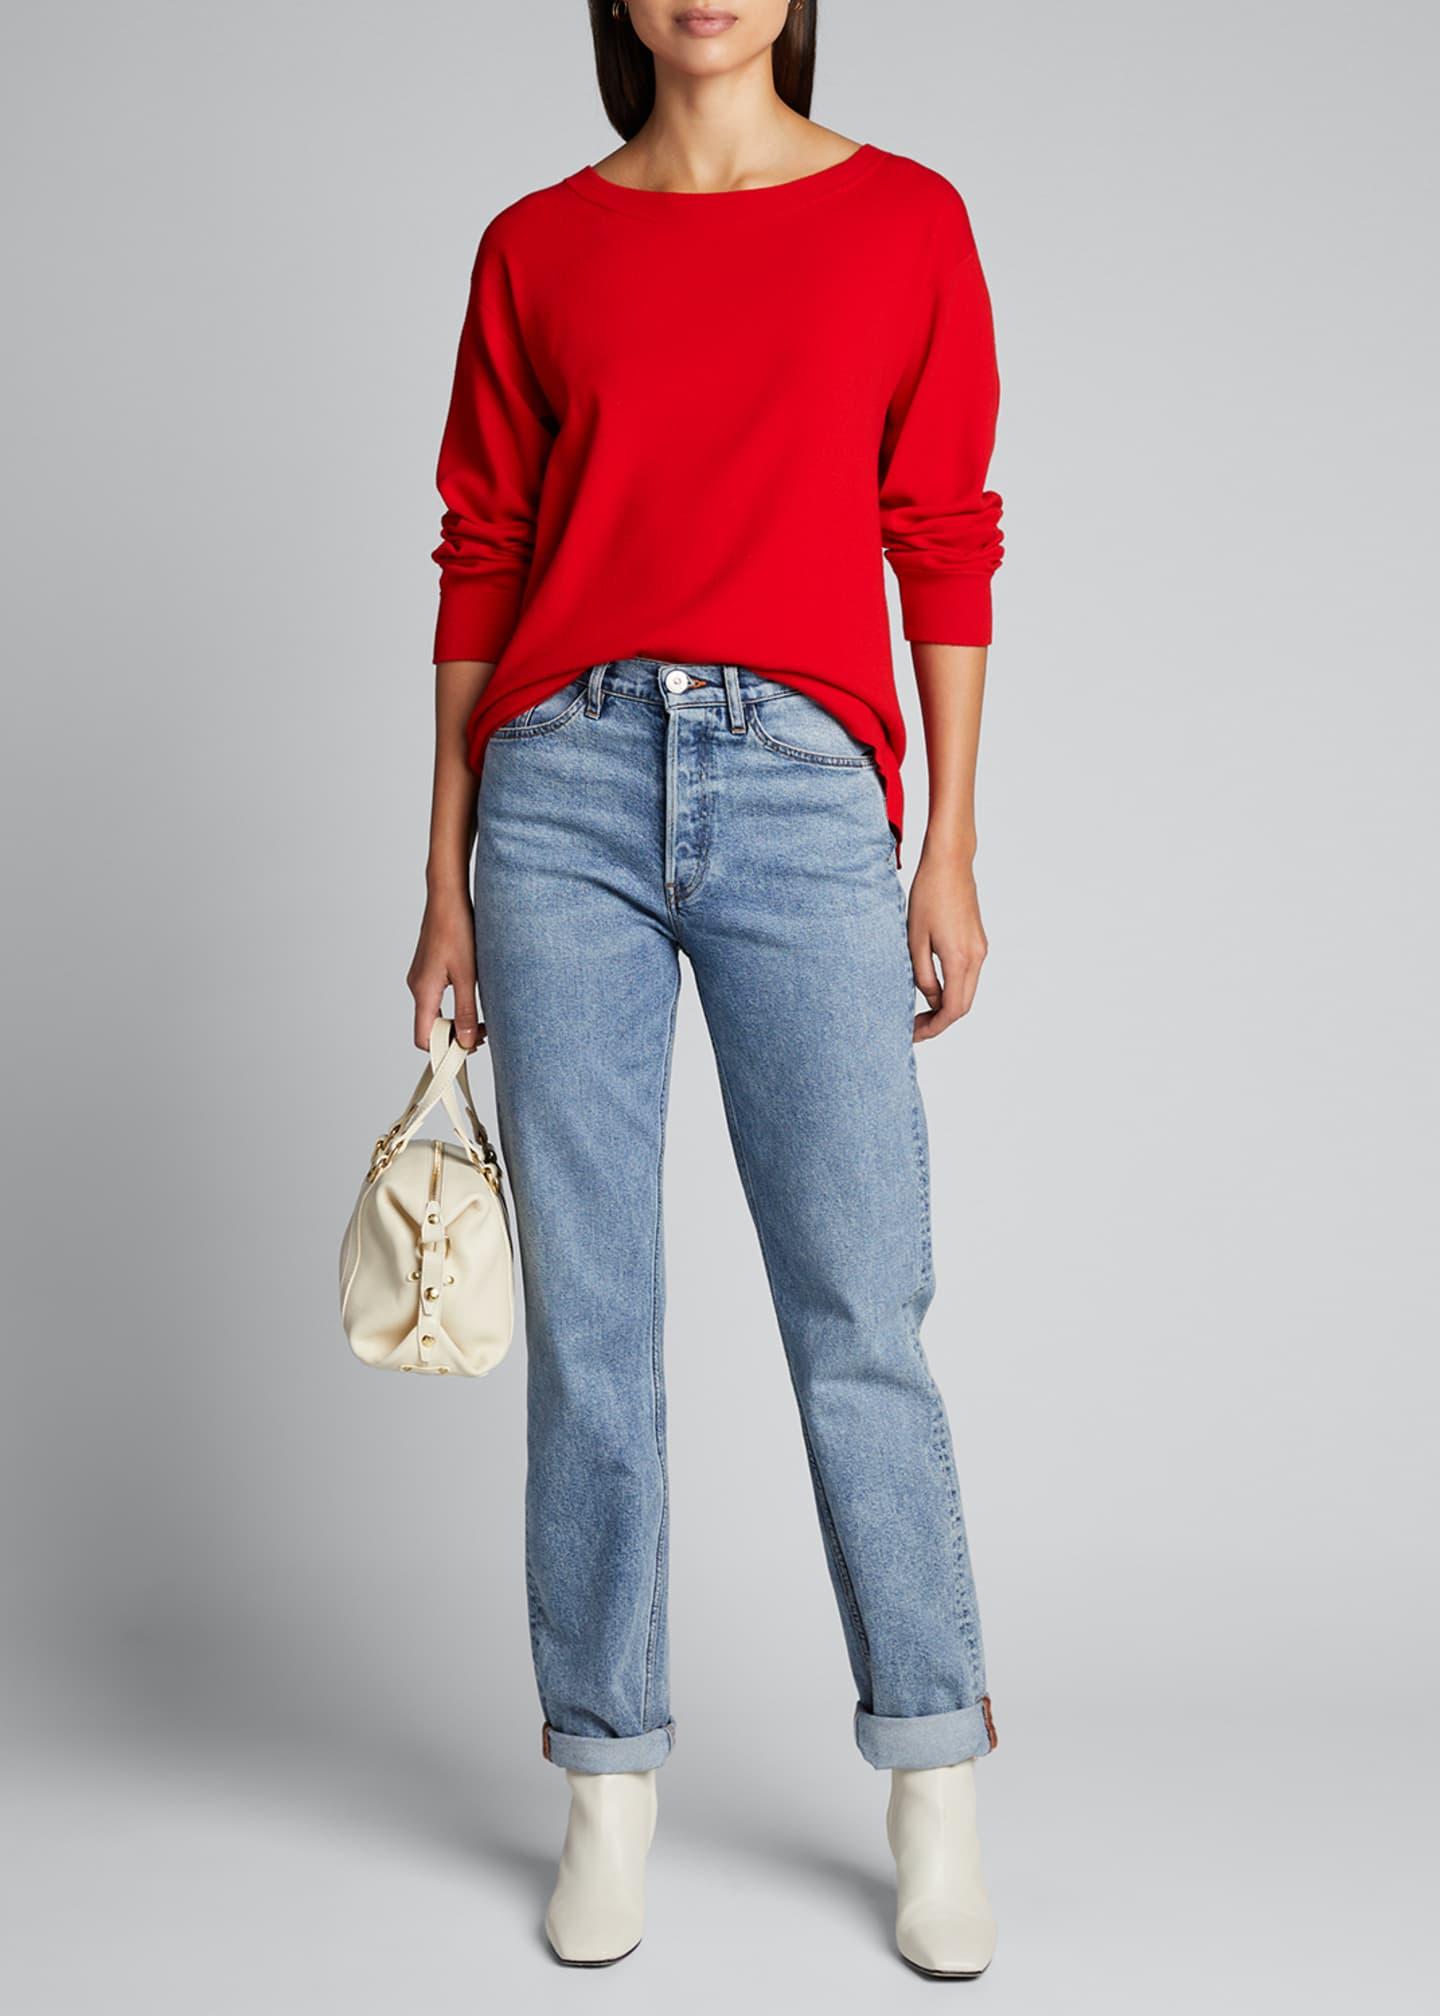 Alice + Olivia Ruela Split-Back Sweater with Hardware